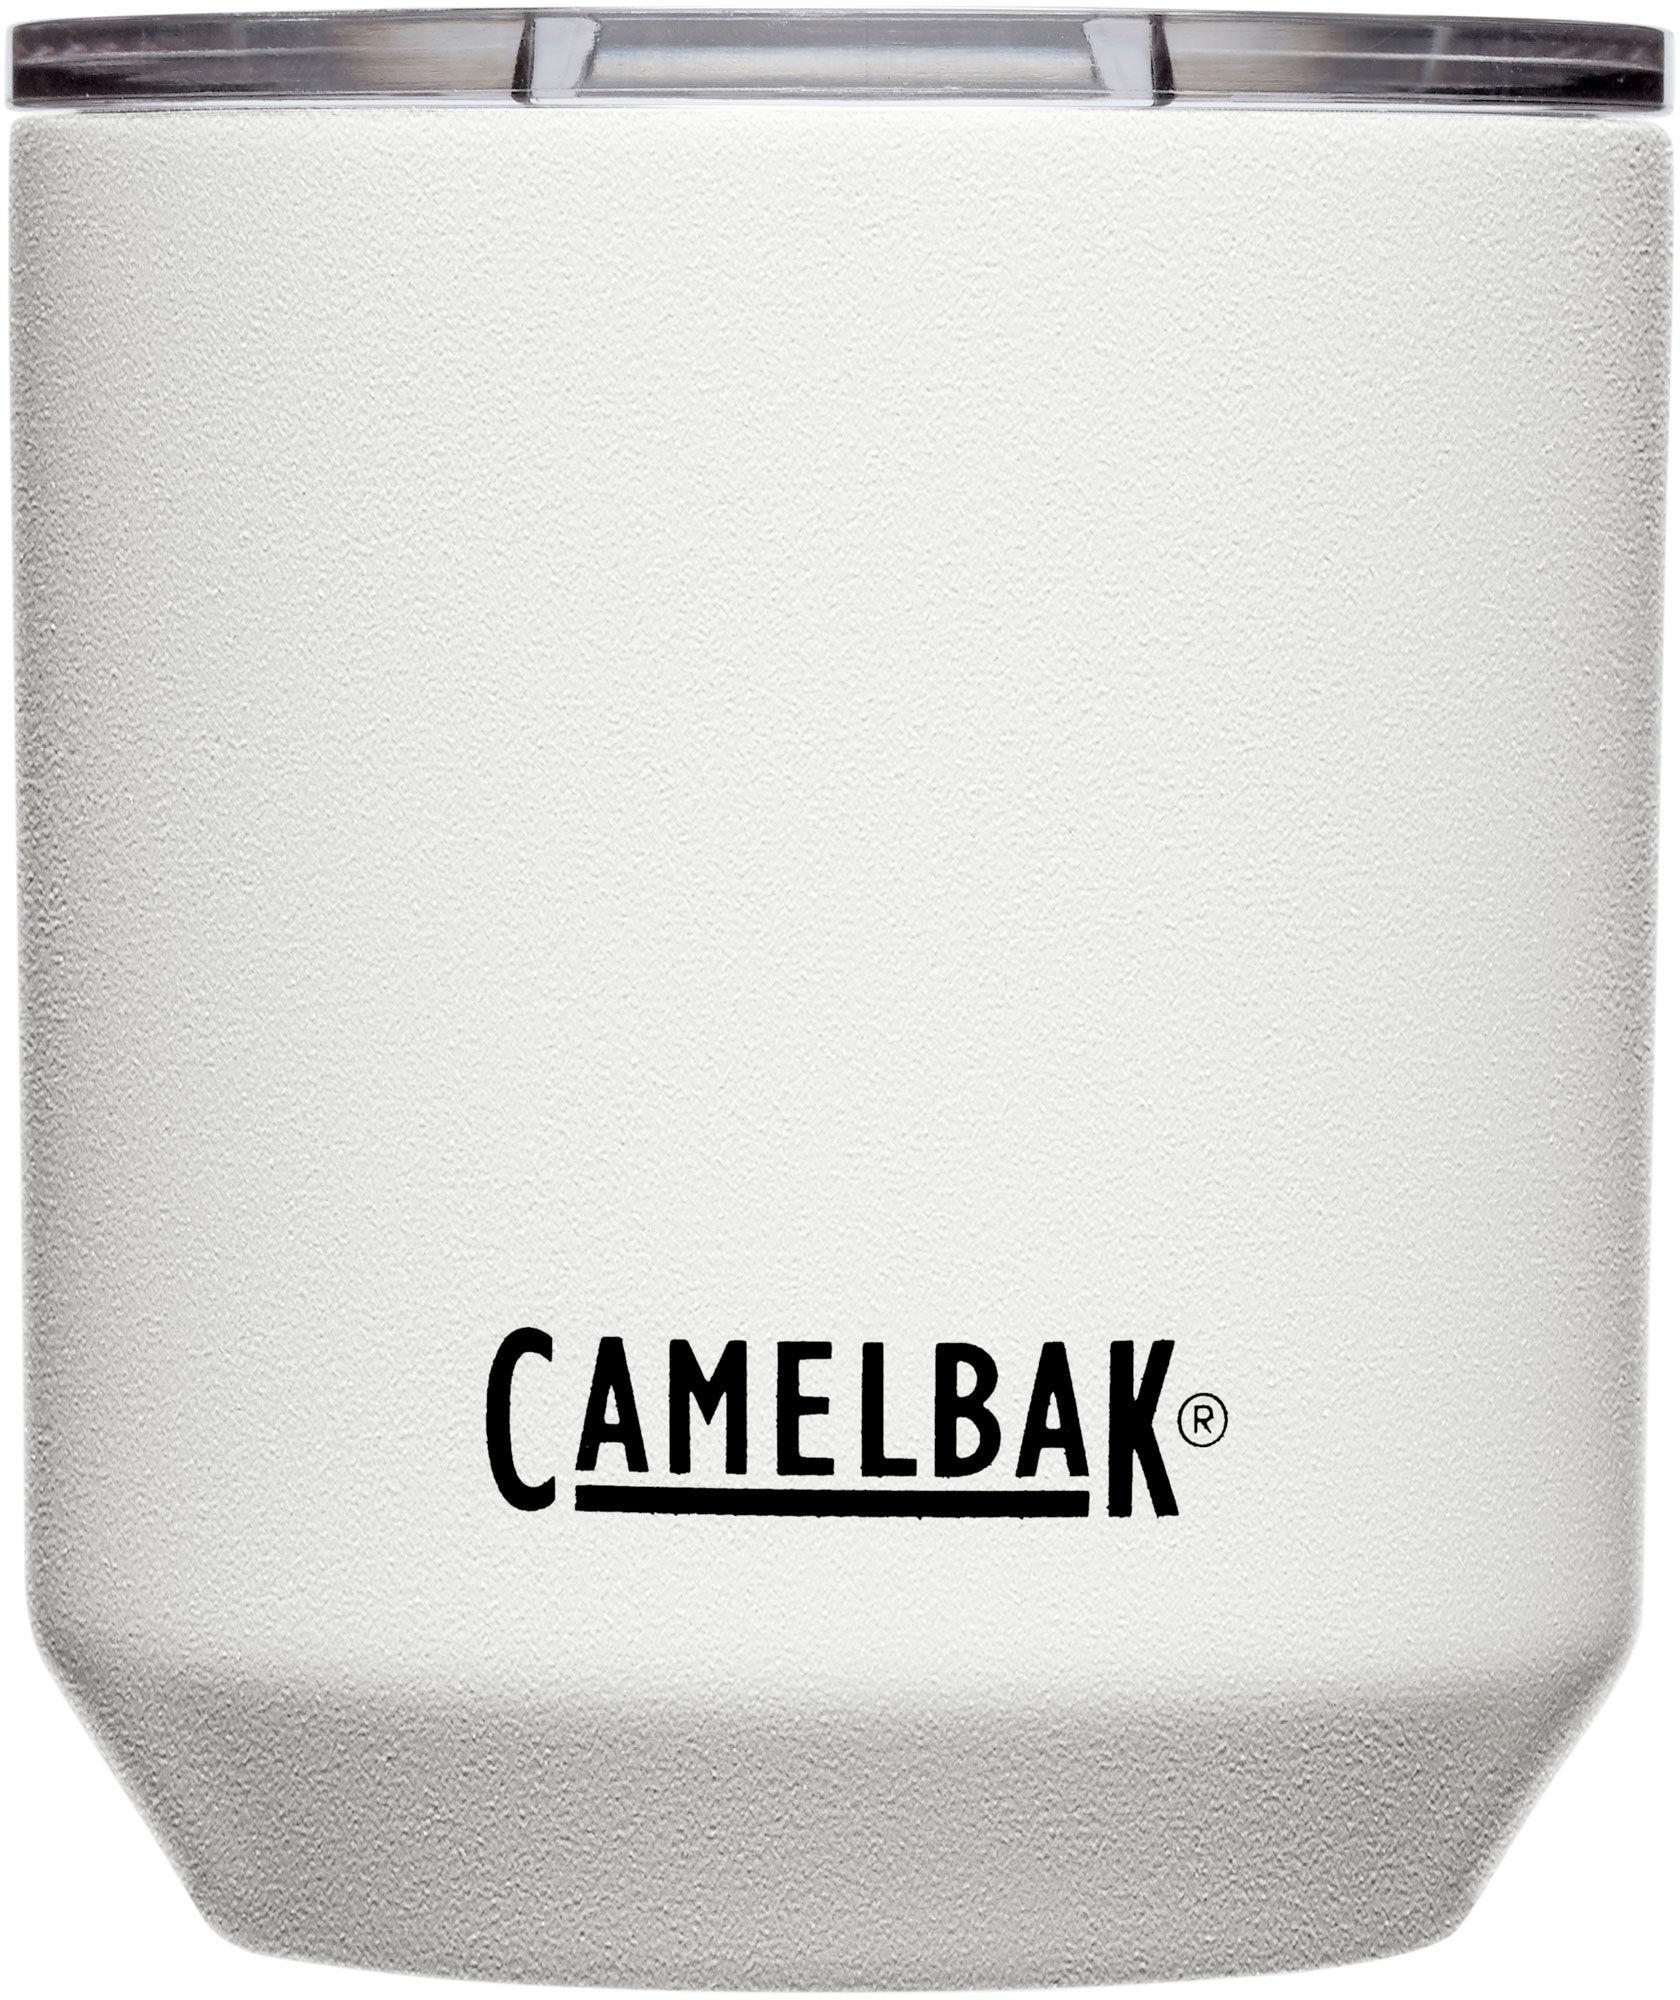 CAMELBAK kubek termiczny Rocks Tumbler SST 300 ml white,886798027623